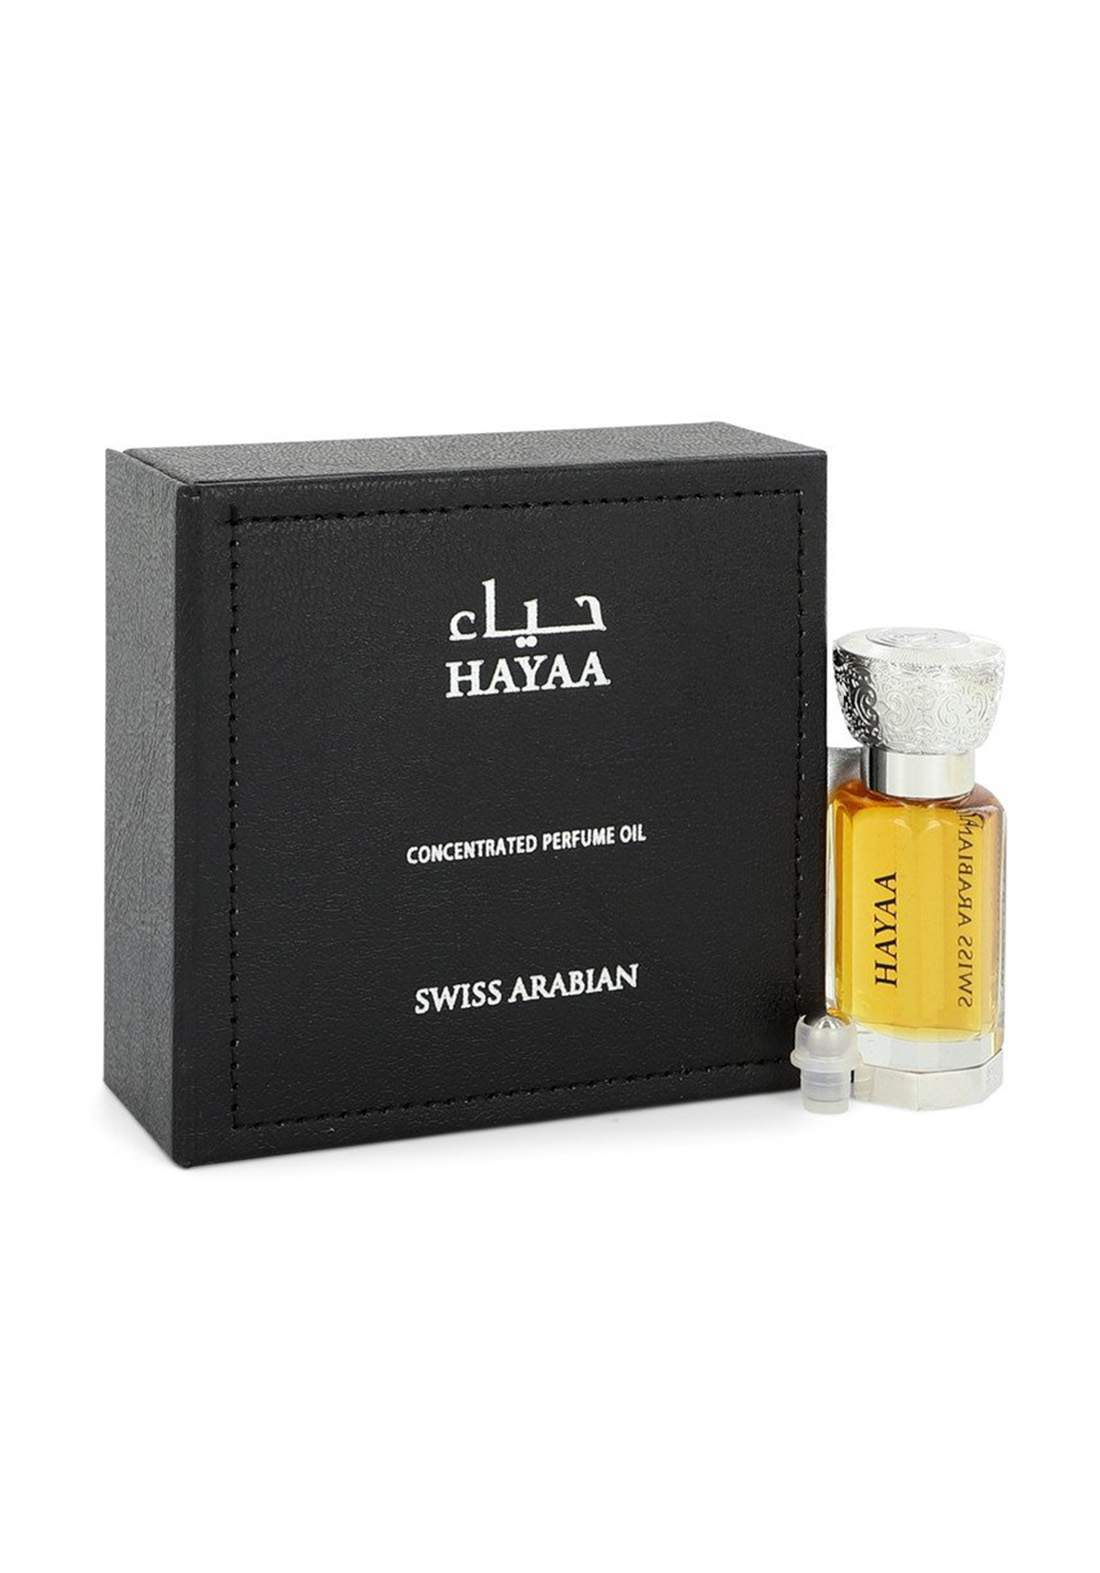 Swiss Arabian 1073 Concentrated Perfume Oil Unisex - 12 ml  عطر زيتي  لكلا الجنسين